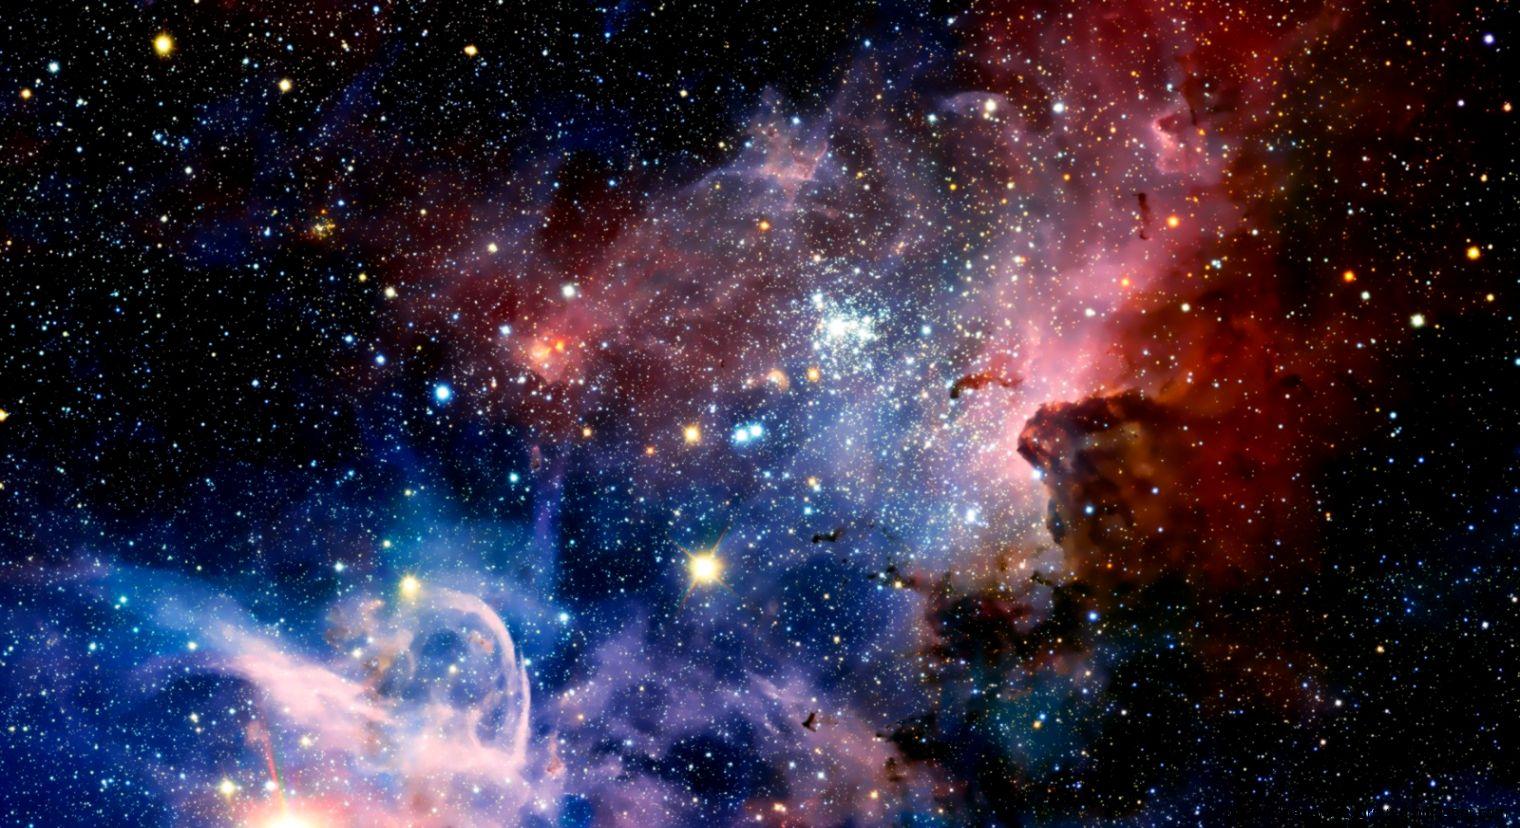 Space Wallpaper 1600x900px 891931